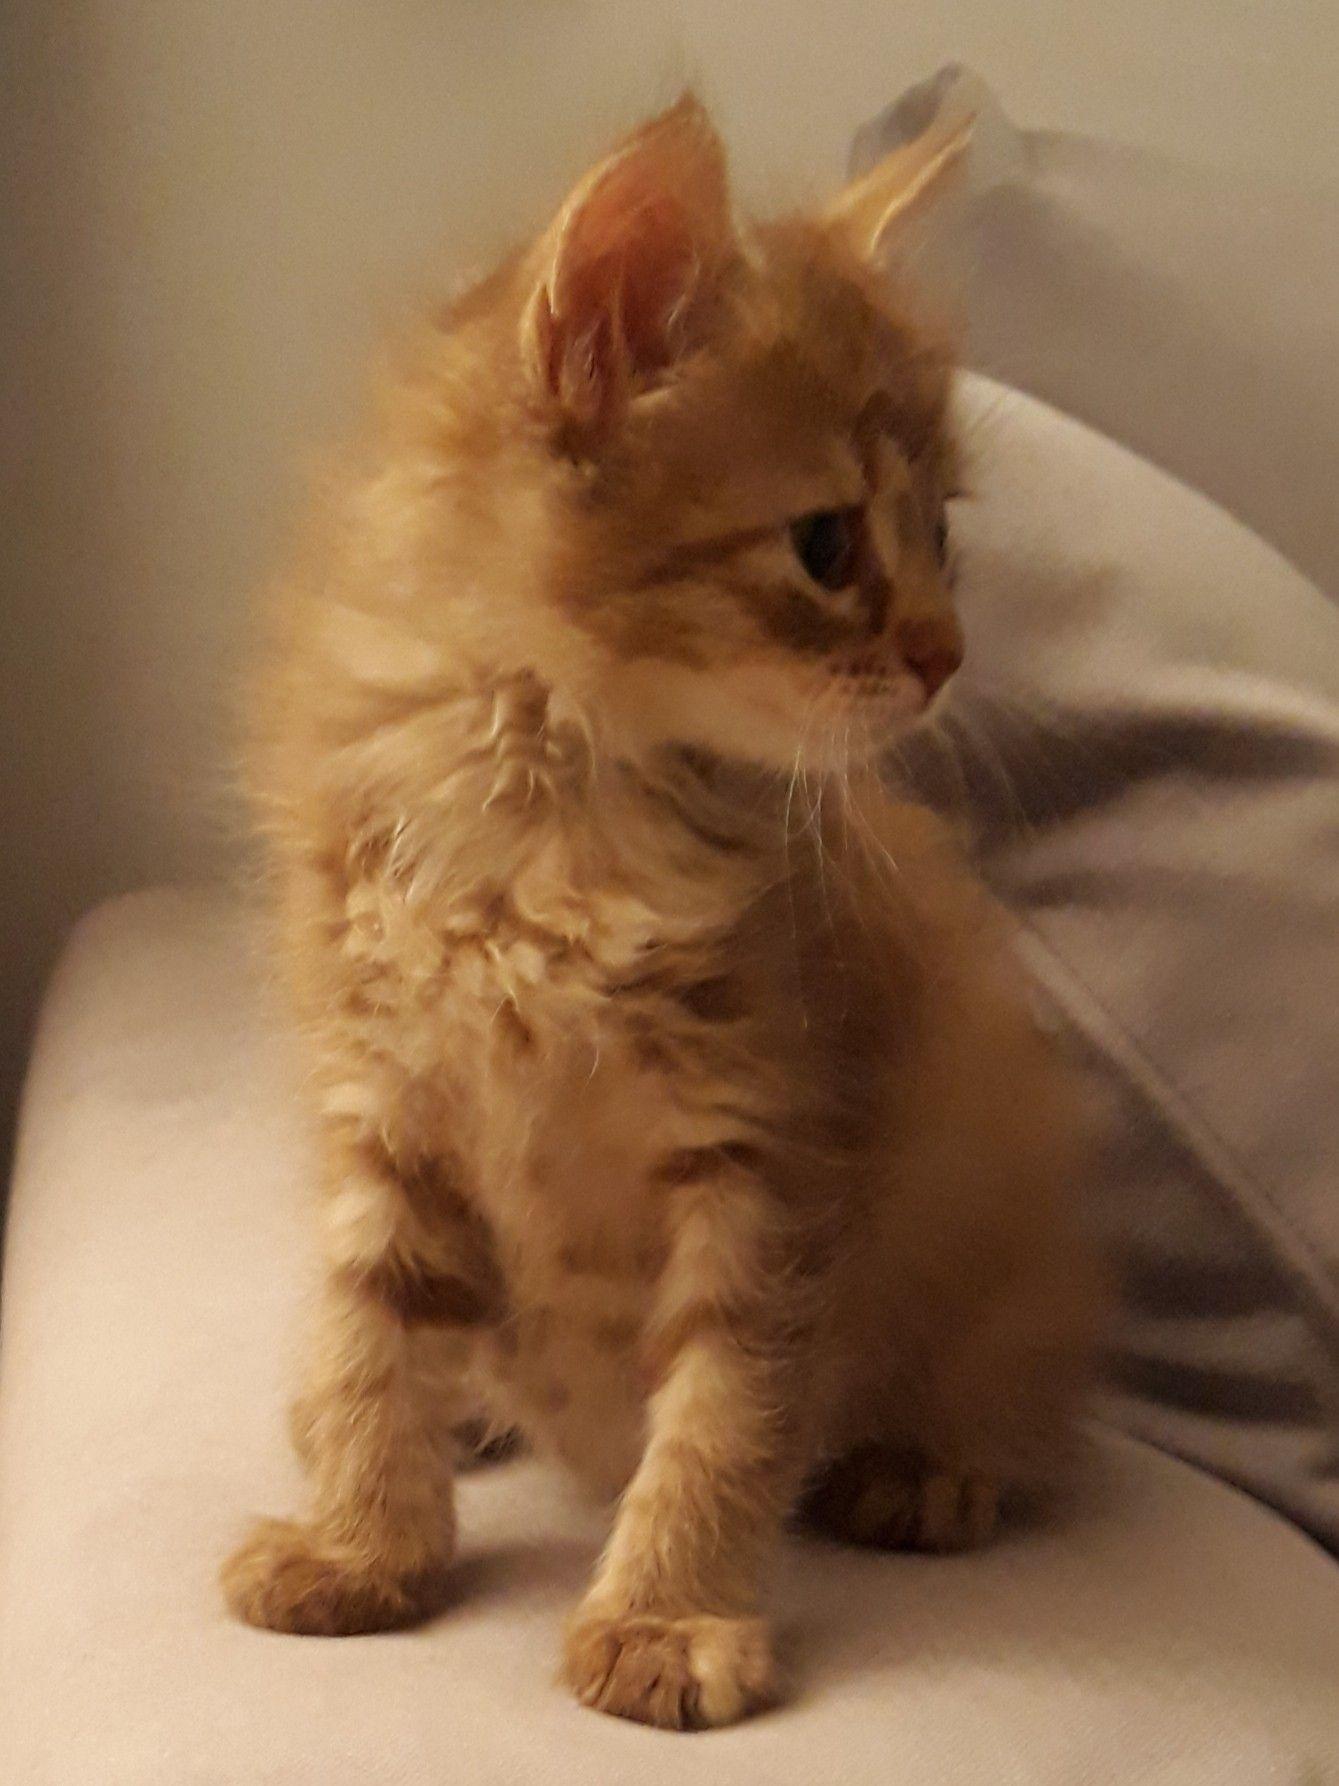 Ginger kitten #gingerkitten Ginger kitten #gingerkitten Ginger kitten #gingerkitten Ginger kitten #gingerkitten Ginger kitten #gingerkitten Ginger kitten #gingerkitten Ginger kitten #gingerkitten Ginger kitten #gingerkitten